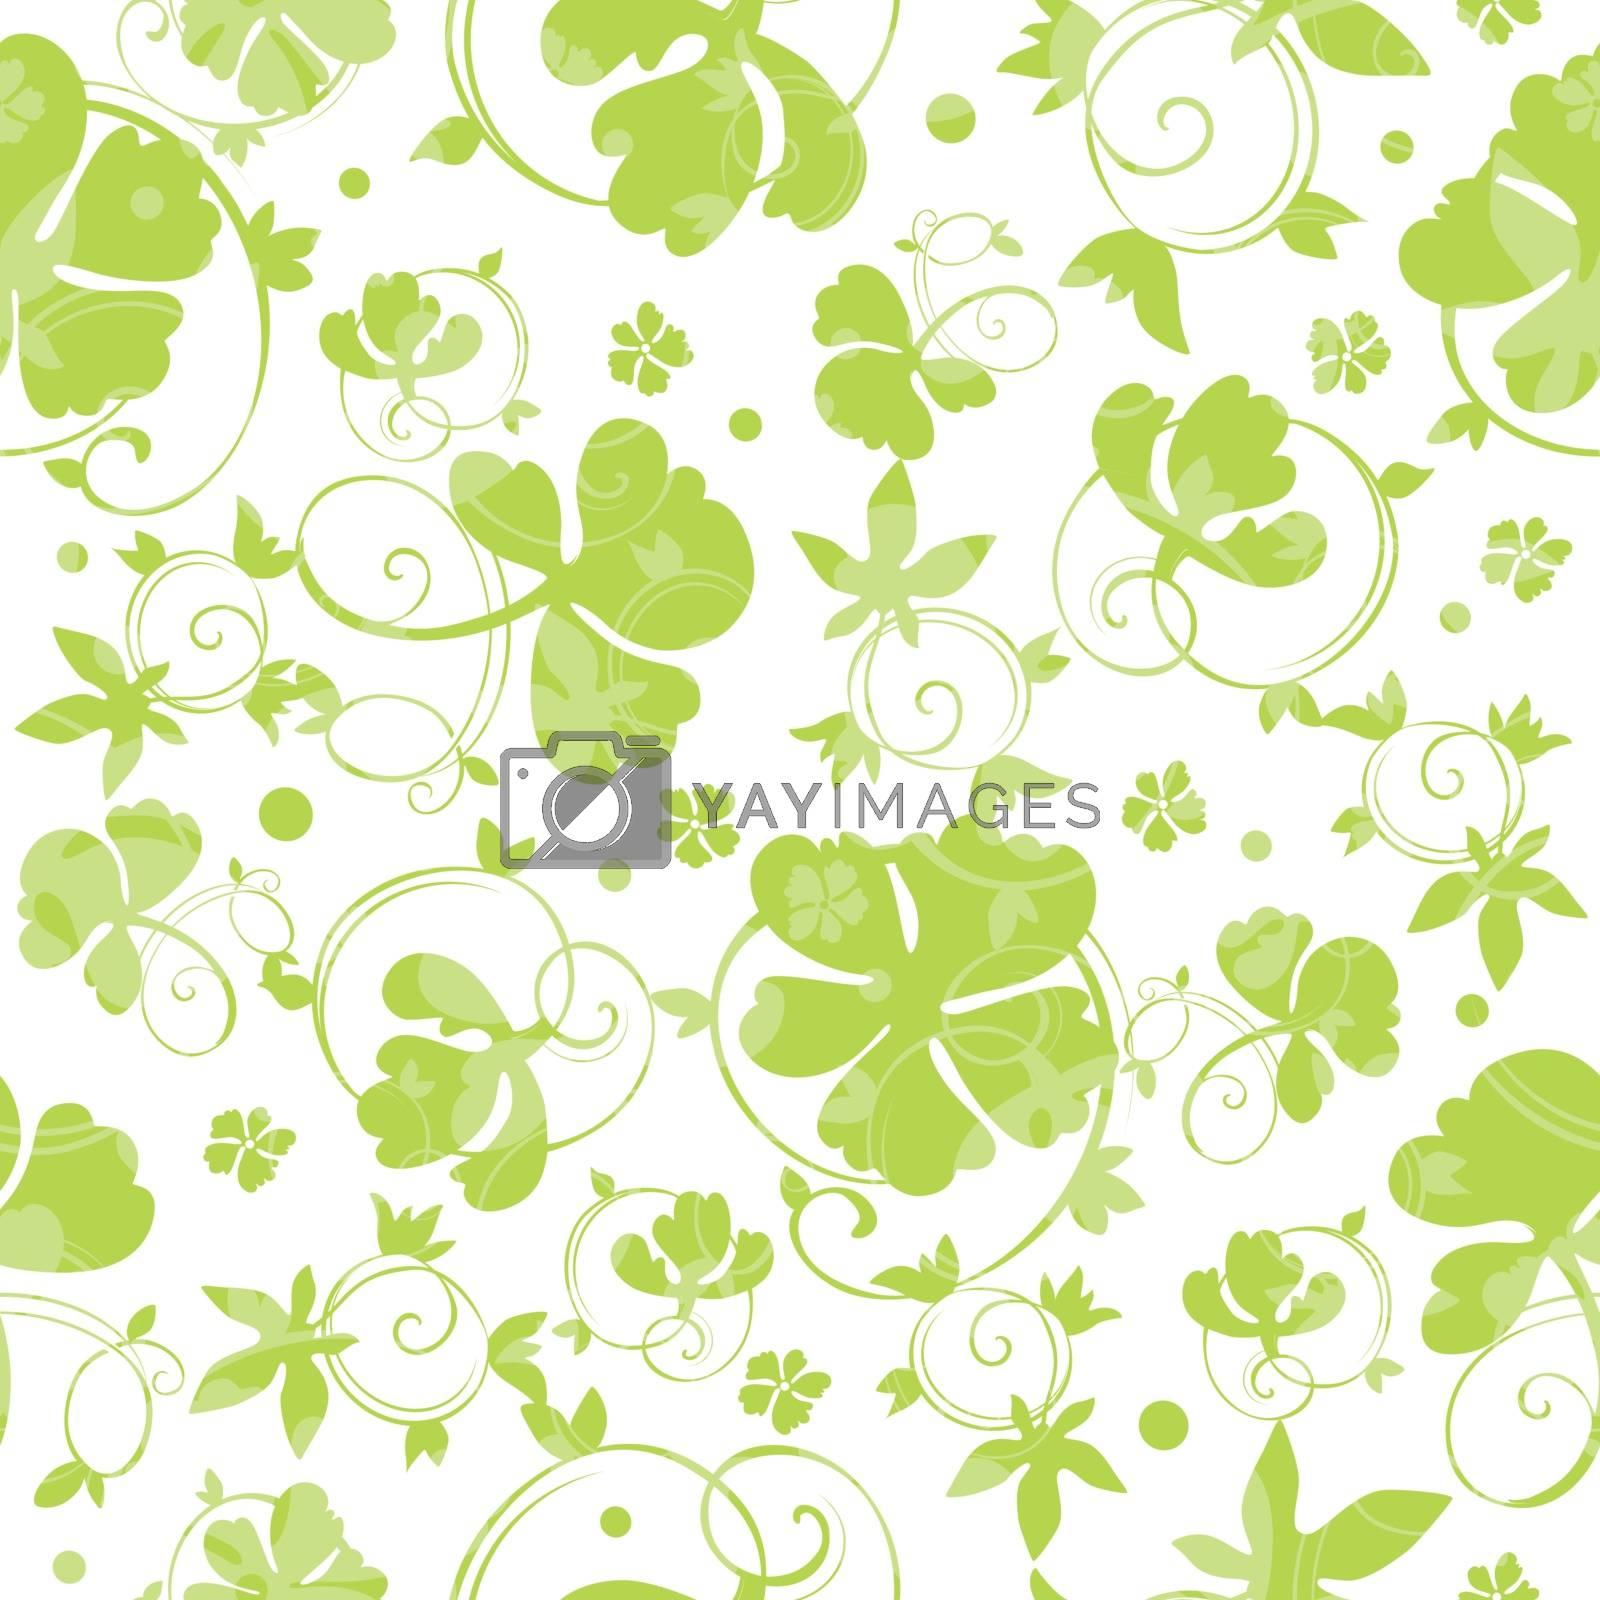 Vector Green Swirly Clover Seamless Pattern graphic design